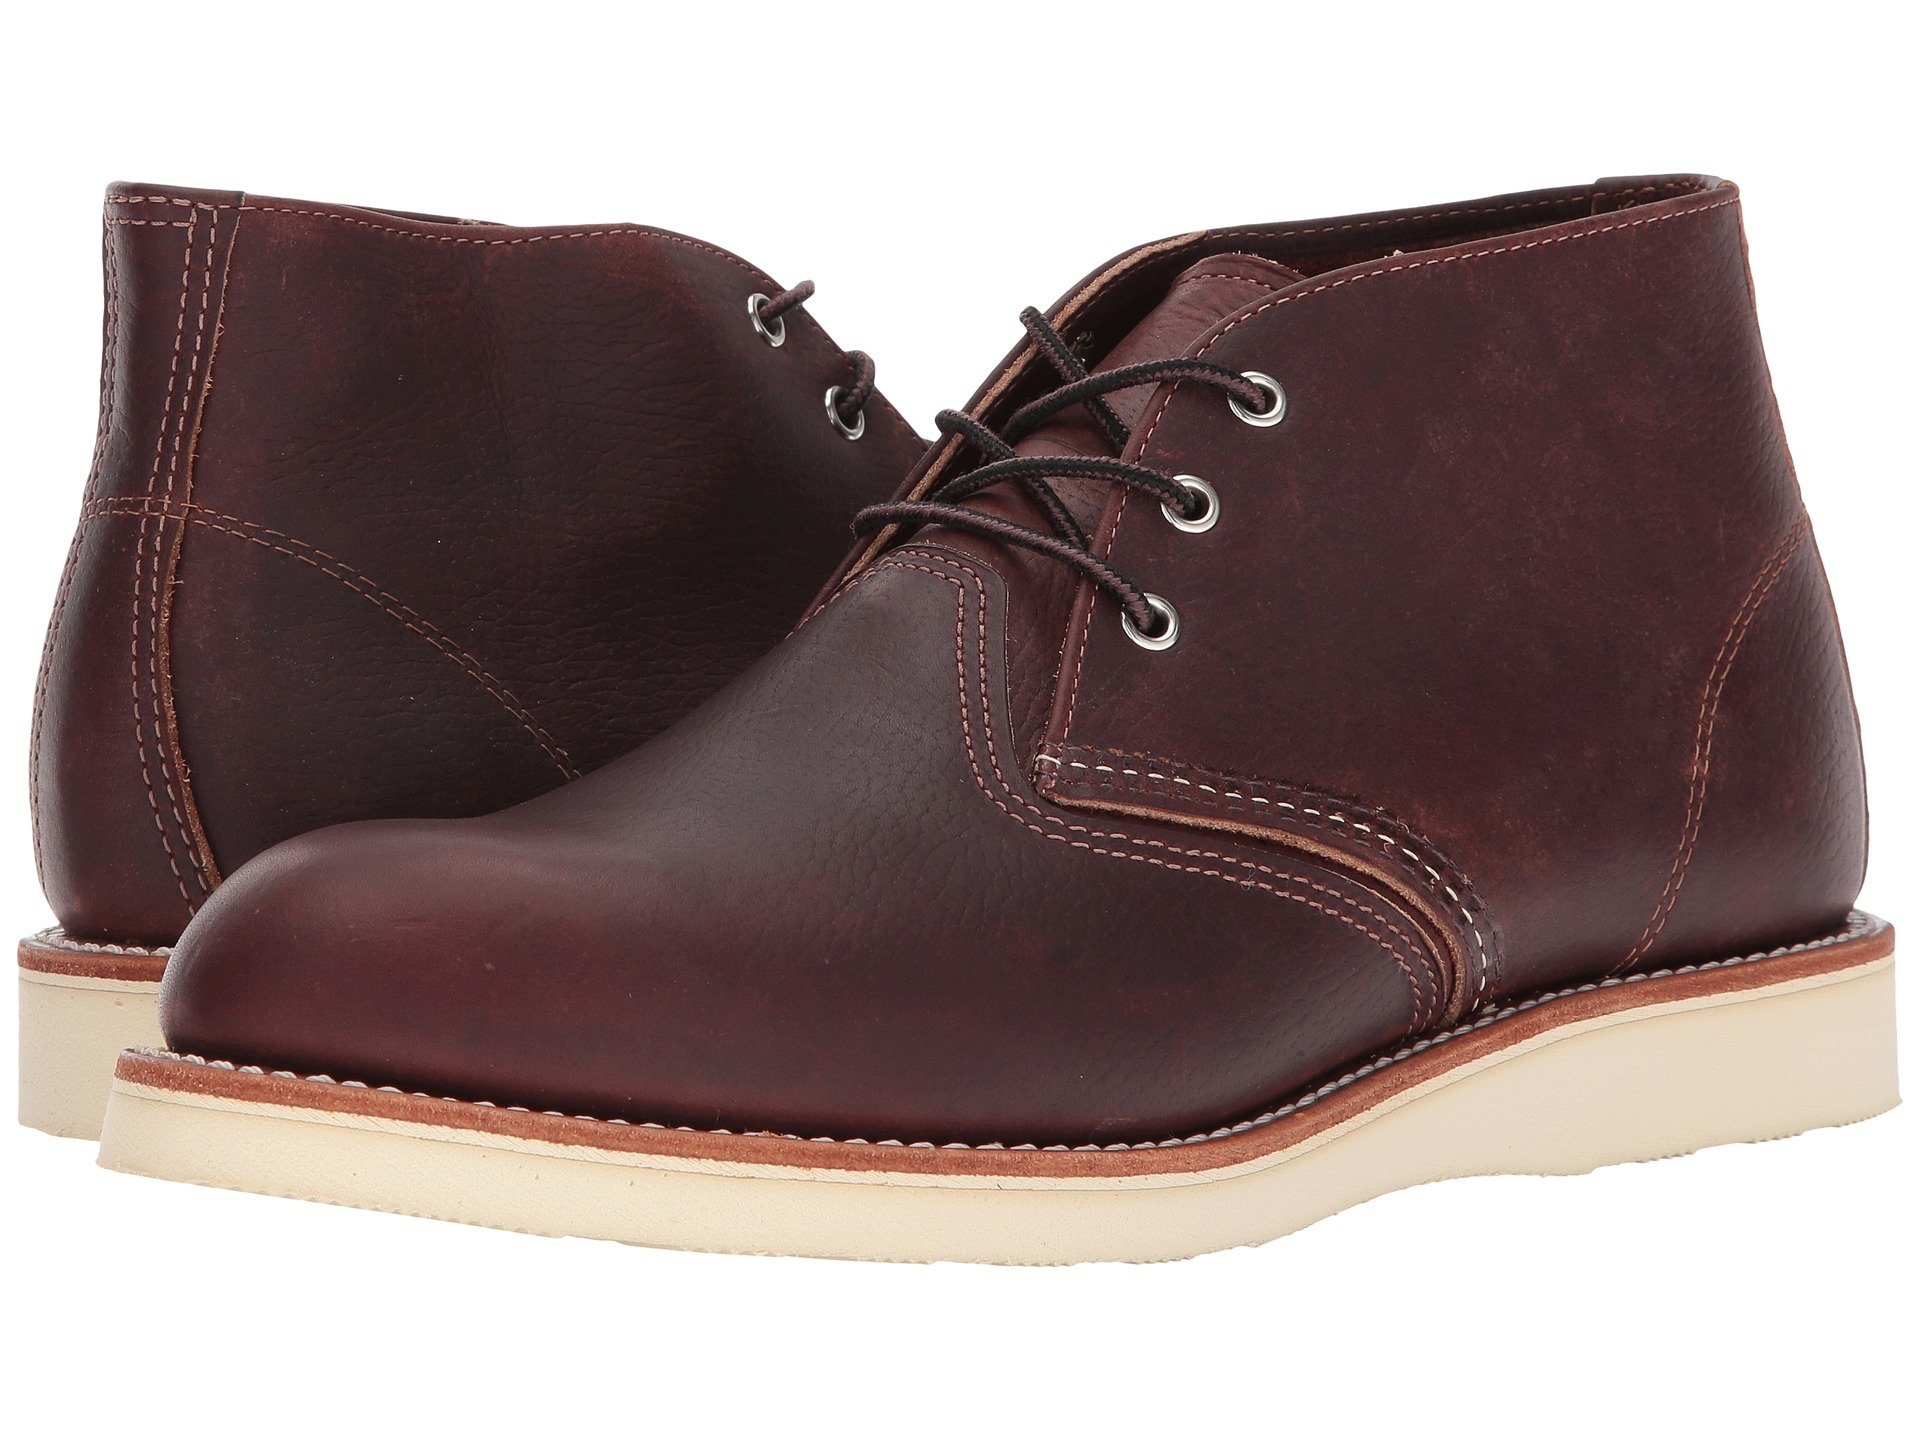 d7c47050e82194 Men s Mahogany Shoes + FREE SHIPPING